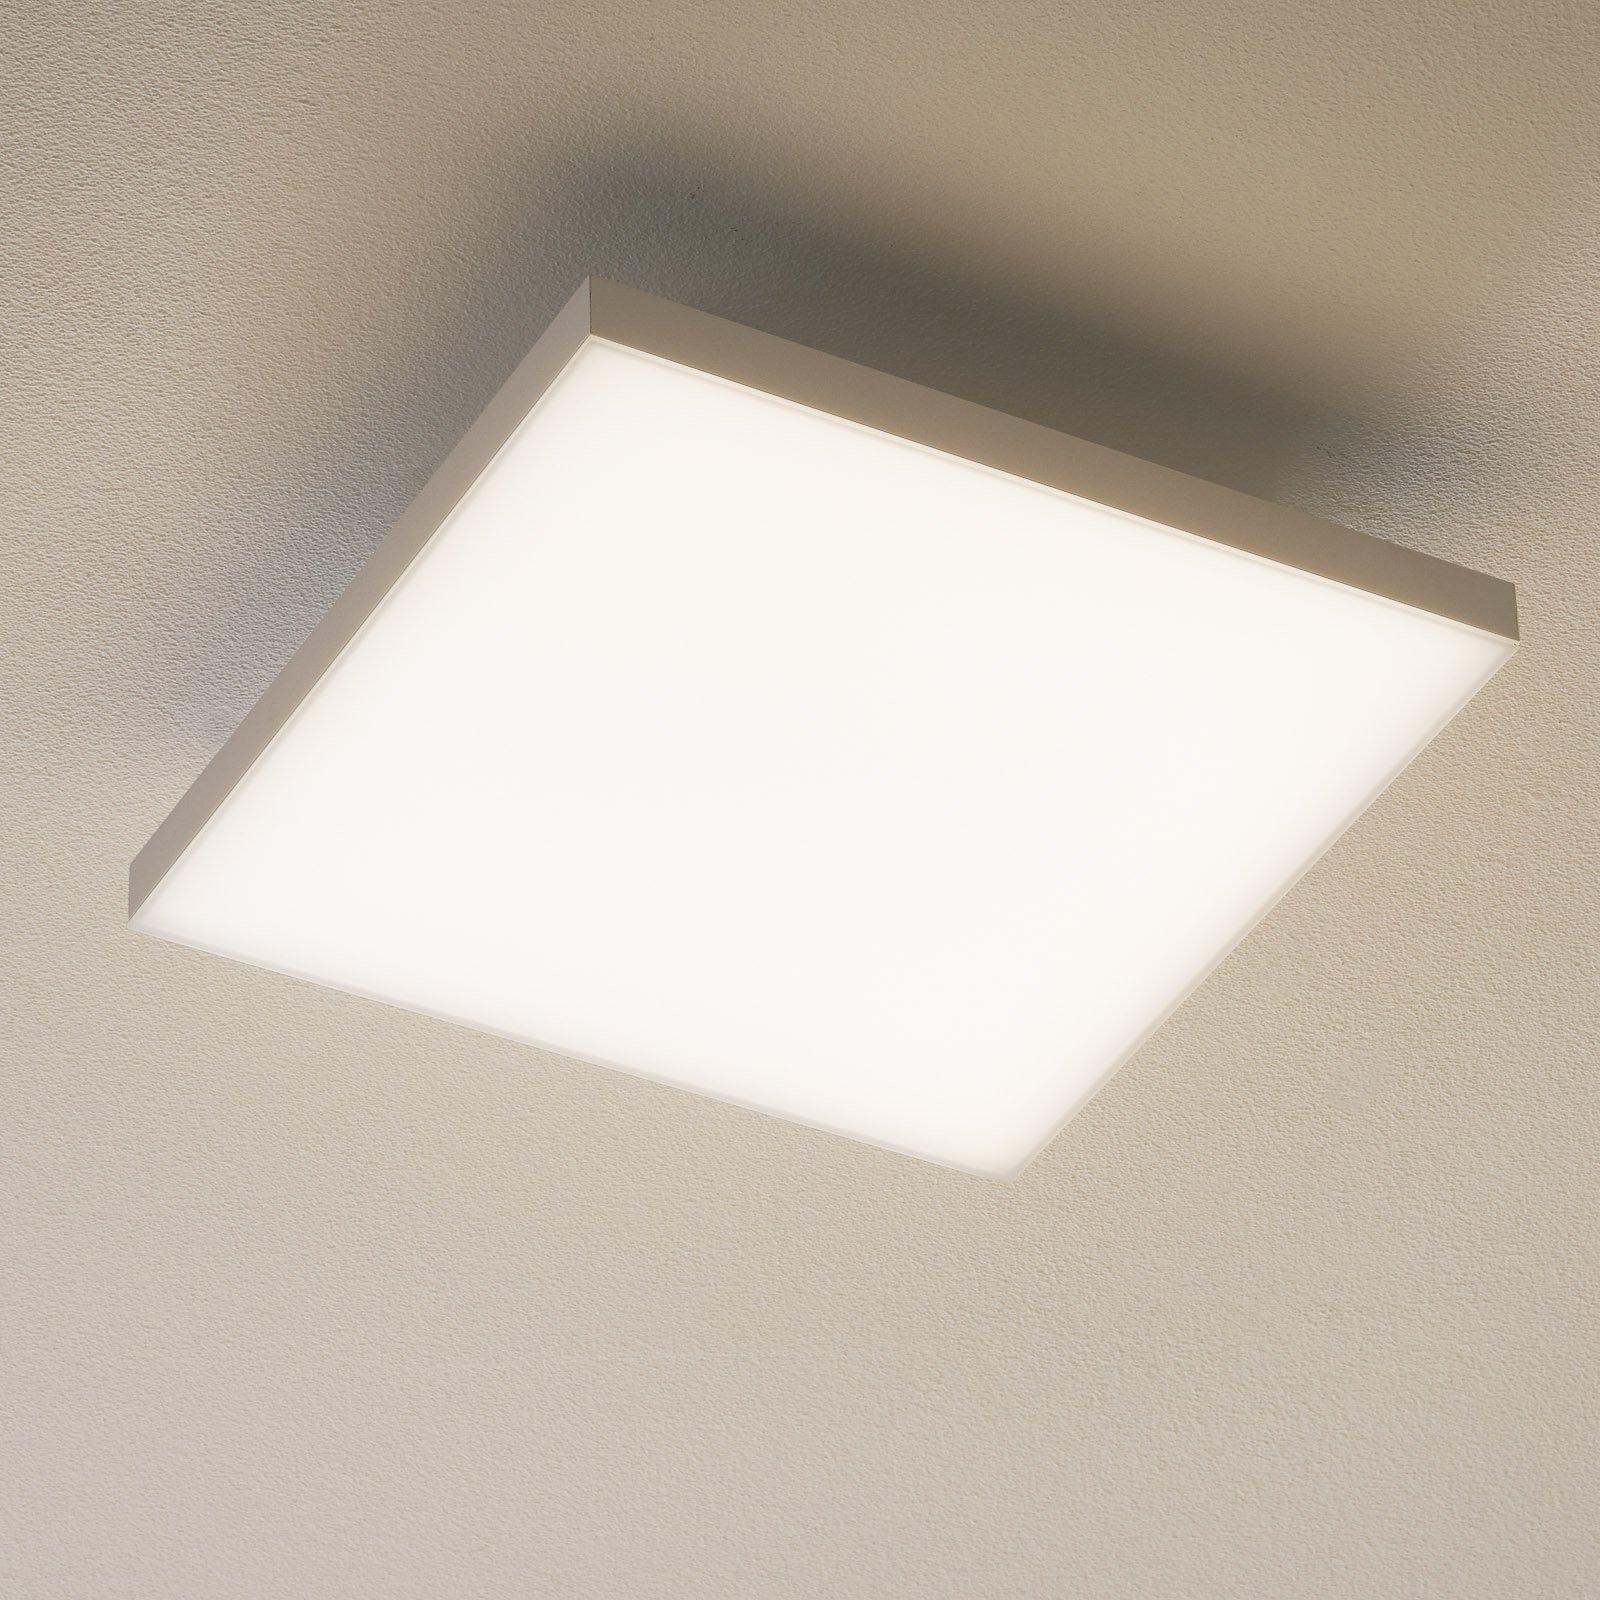 Paul Neuhaus Frameless taklampe CCT 30x30cm